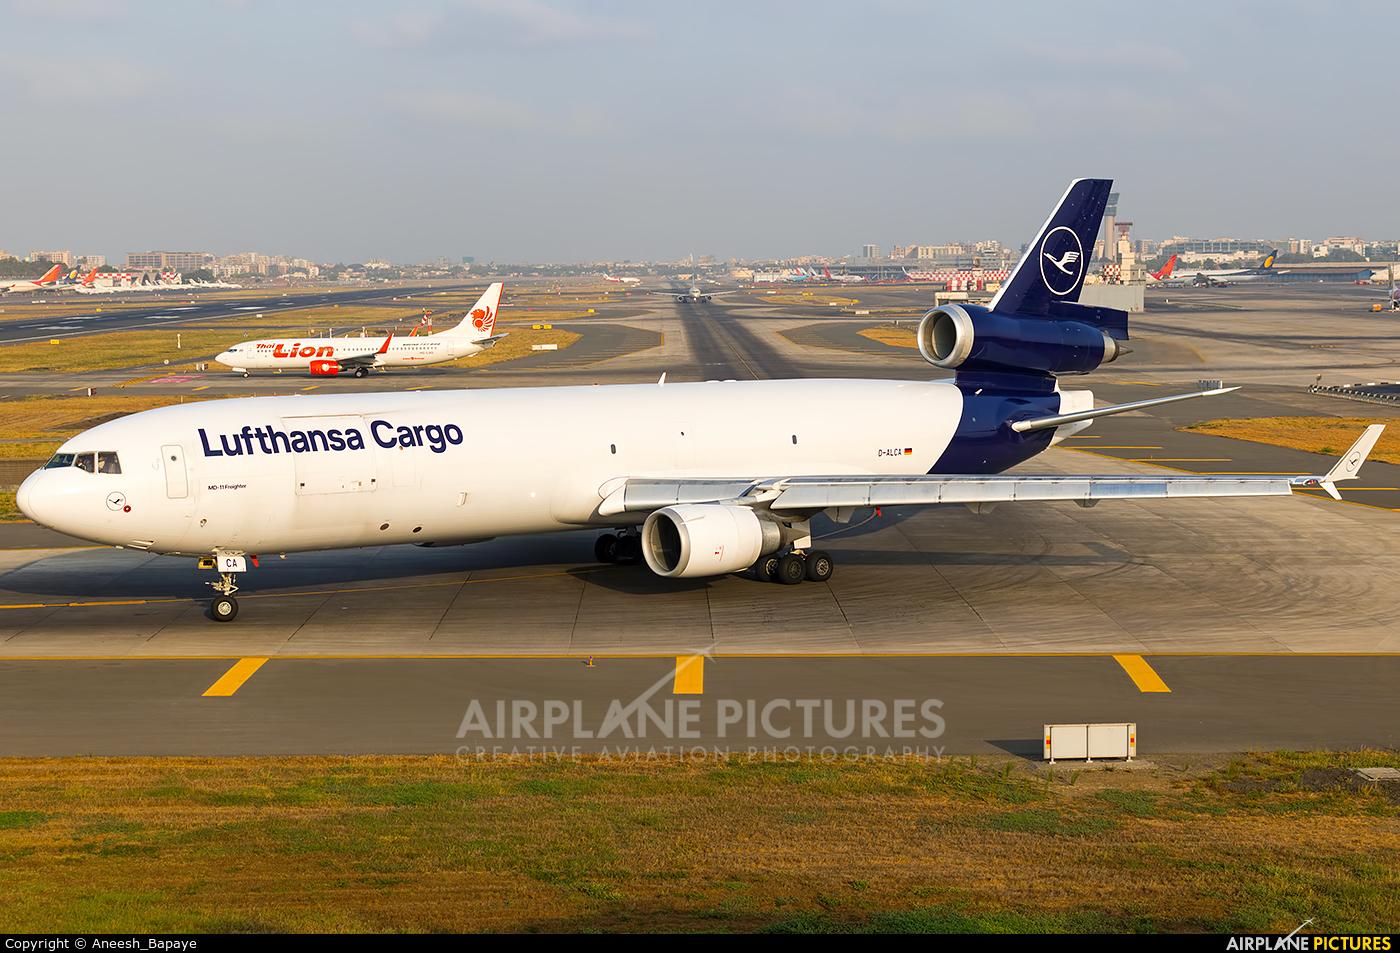 Lufthansa Cargo D-ALCA aircraft at Mumbai - Chhatrapati Shivaji Intl